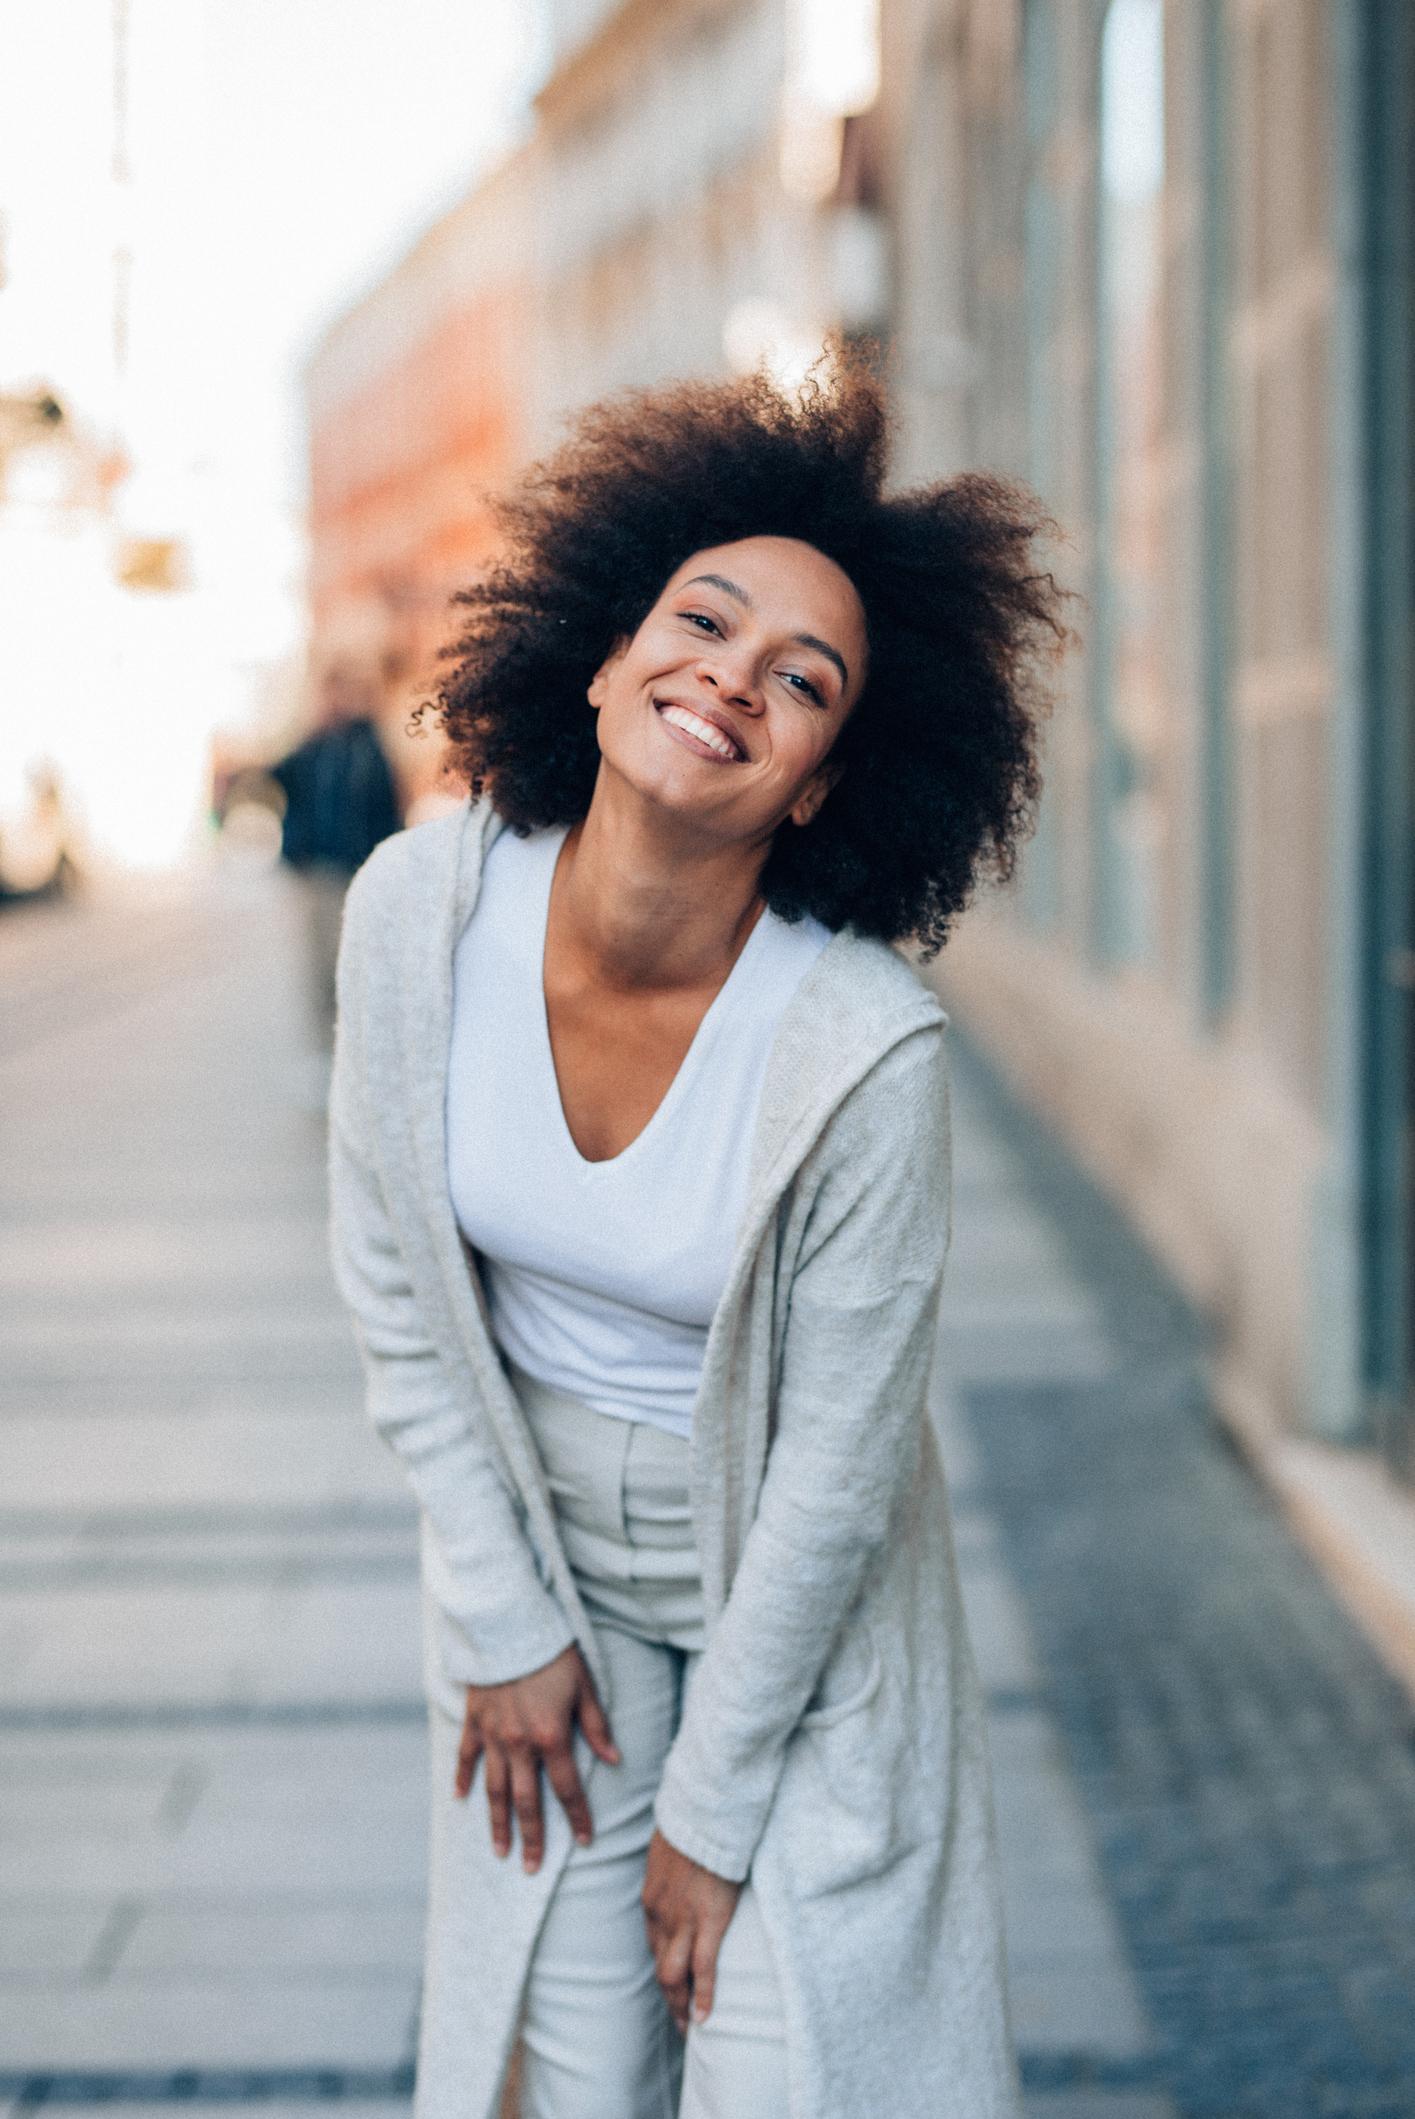 Young beautiful afro-american woman